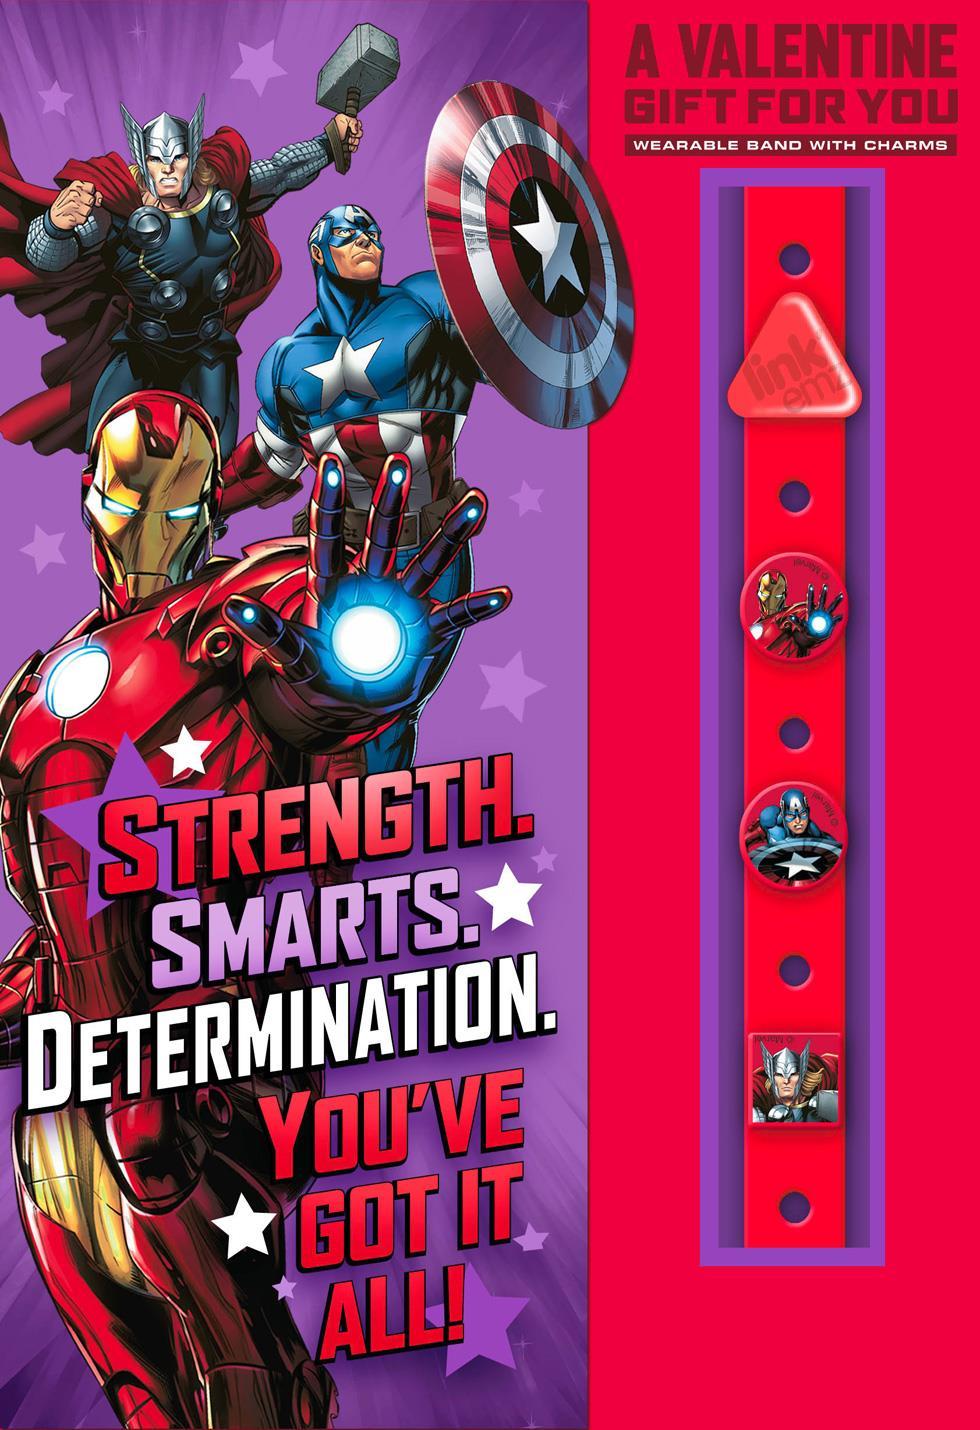 marvel avengers valentine u0026 39 s day card with link u0026 39 emz